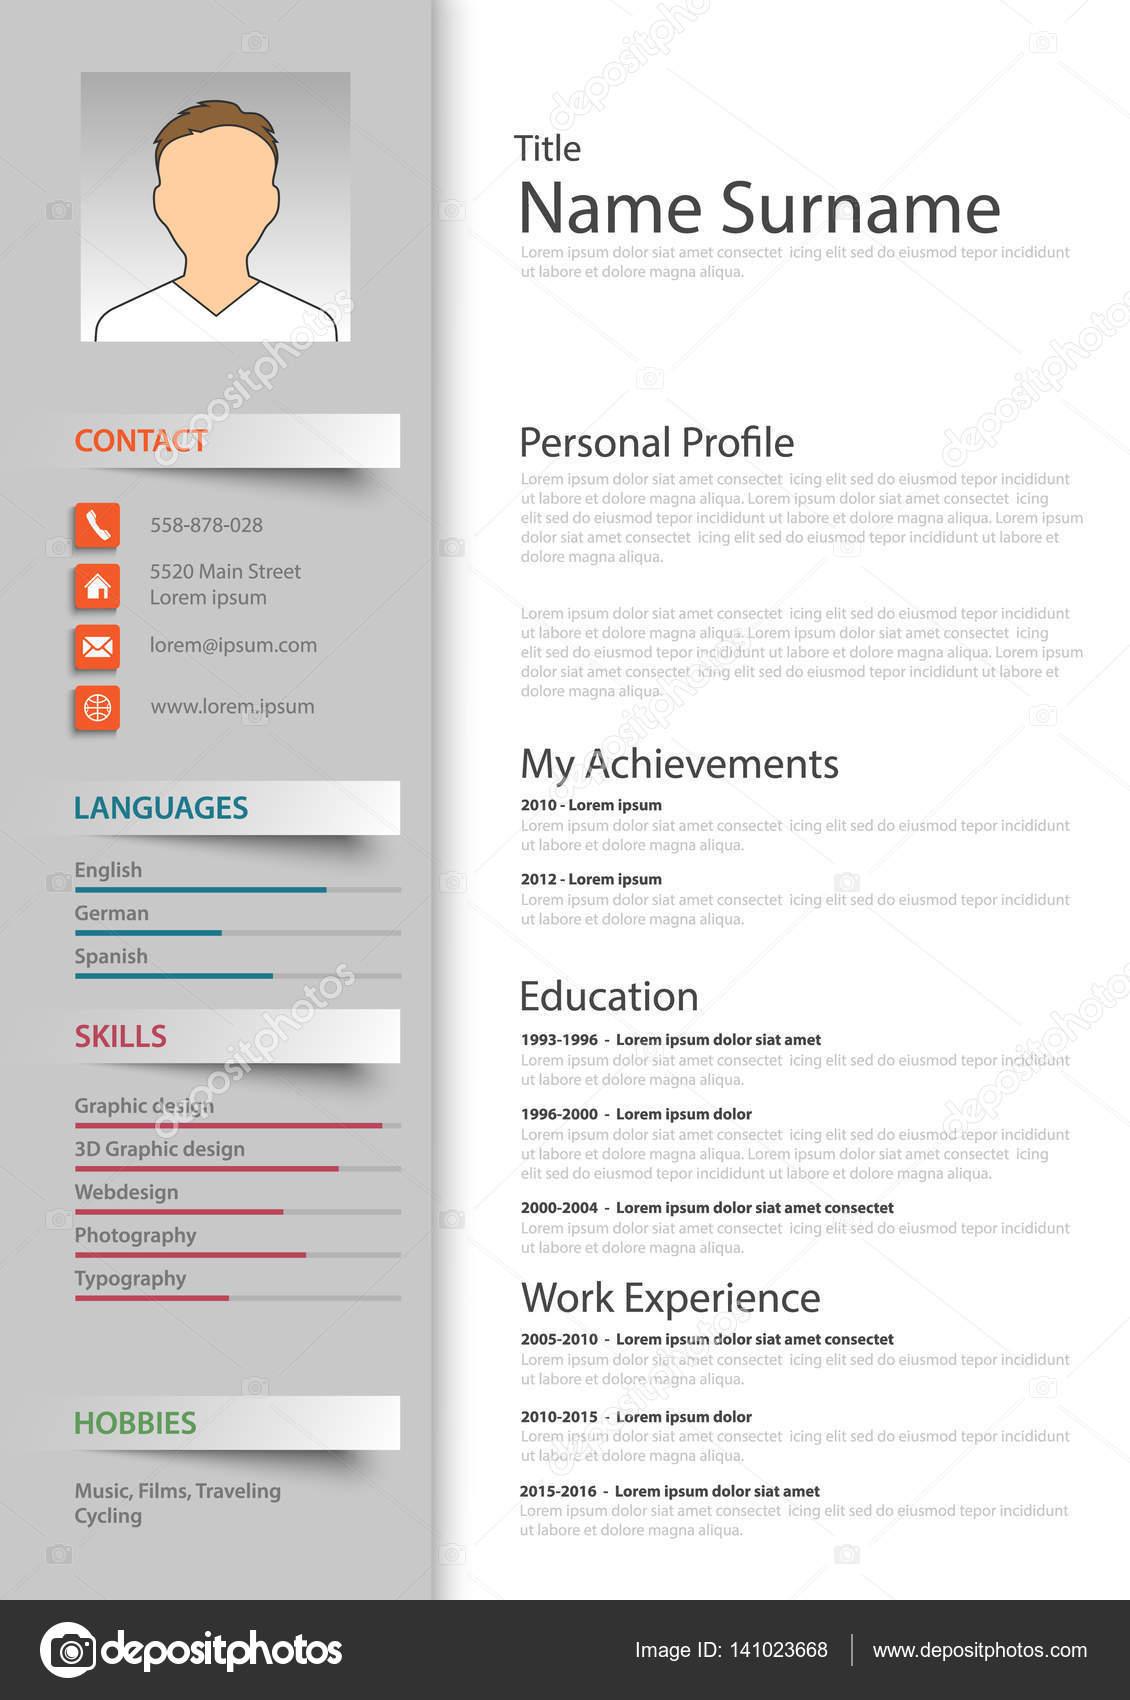 Professional resume cv template — Stock Vector © Plisman #141023668